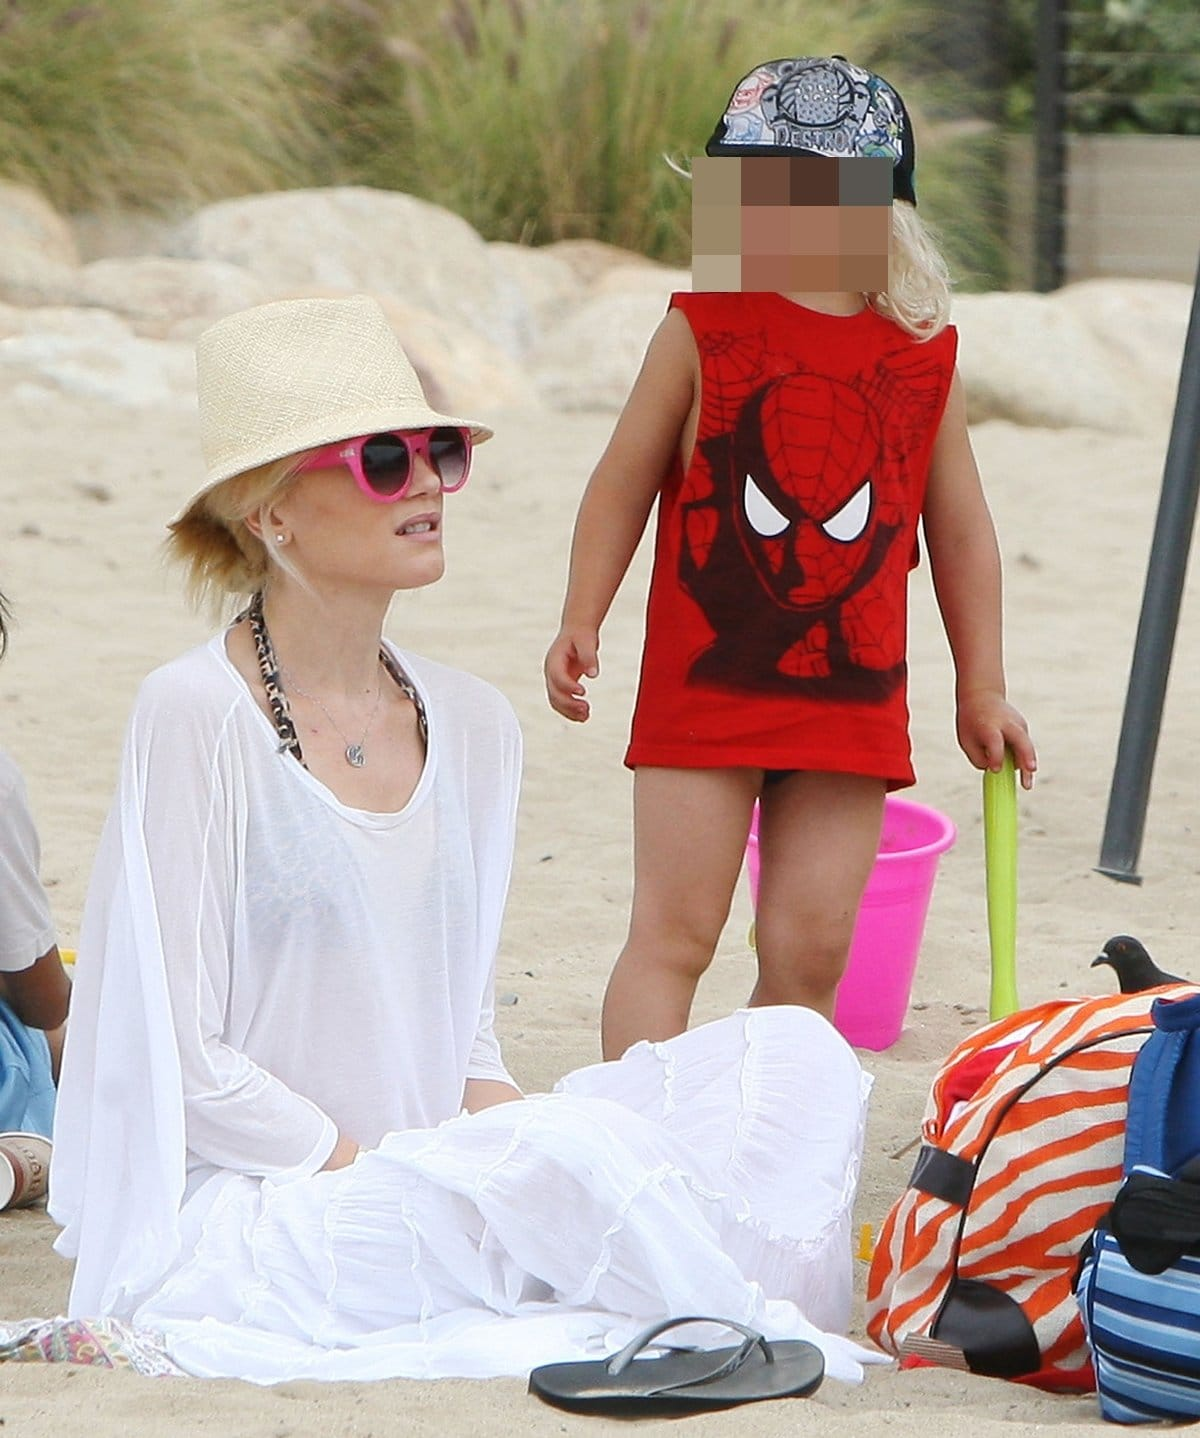 Gwen Stefani and Zuma Rossdale enjoy the day on Santa Monica Beach in Los Angeles